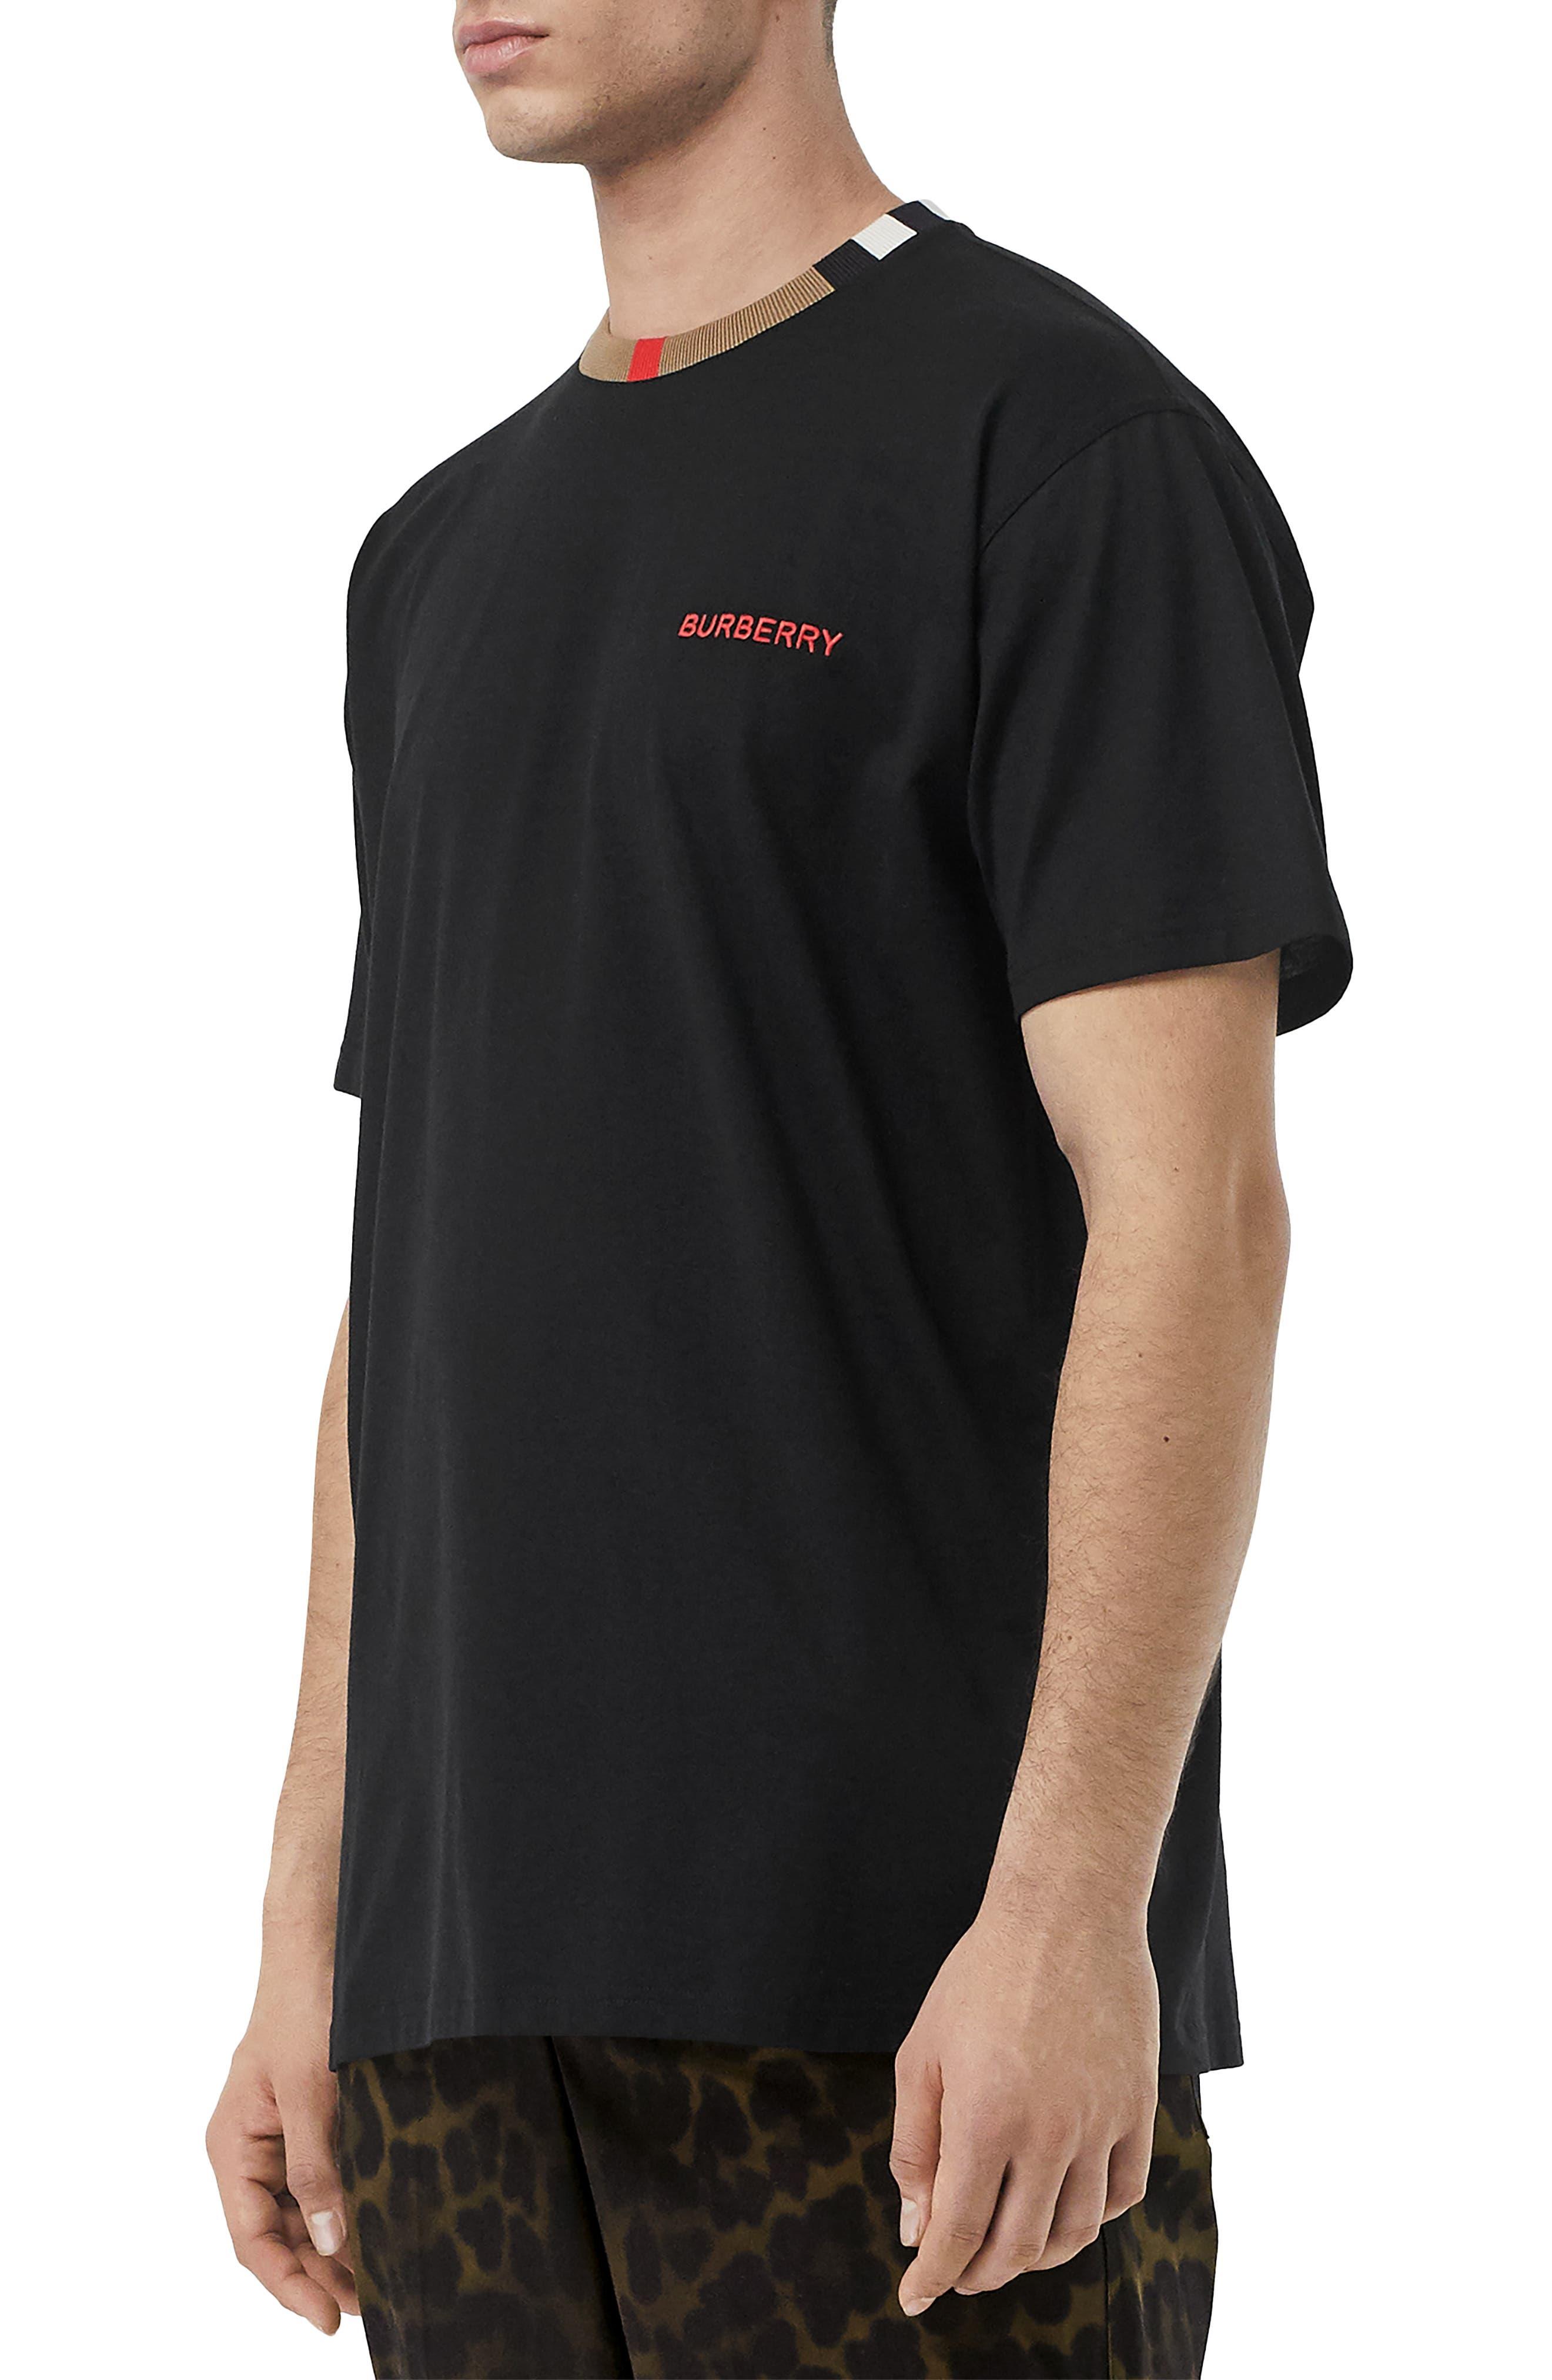 BURBERRY, Jayson Icon Stripe T-Shirt, Alternate thumbnail 3, color, BLACK